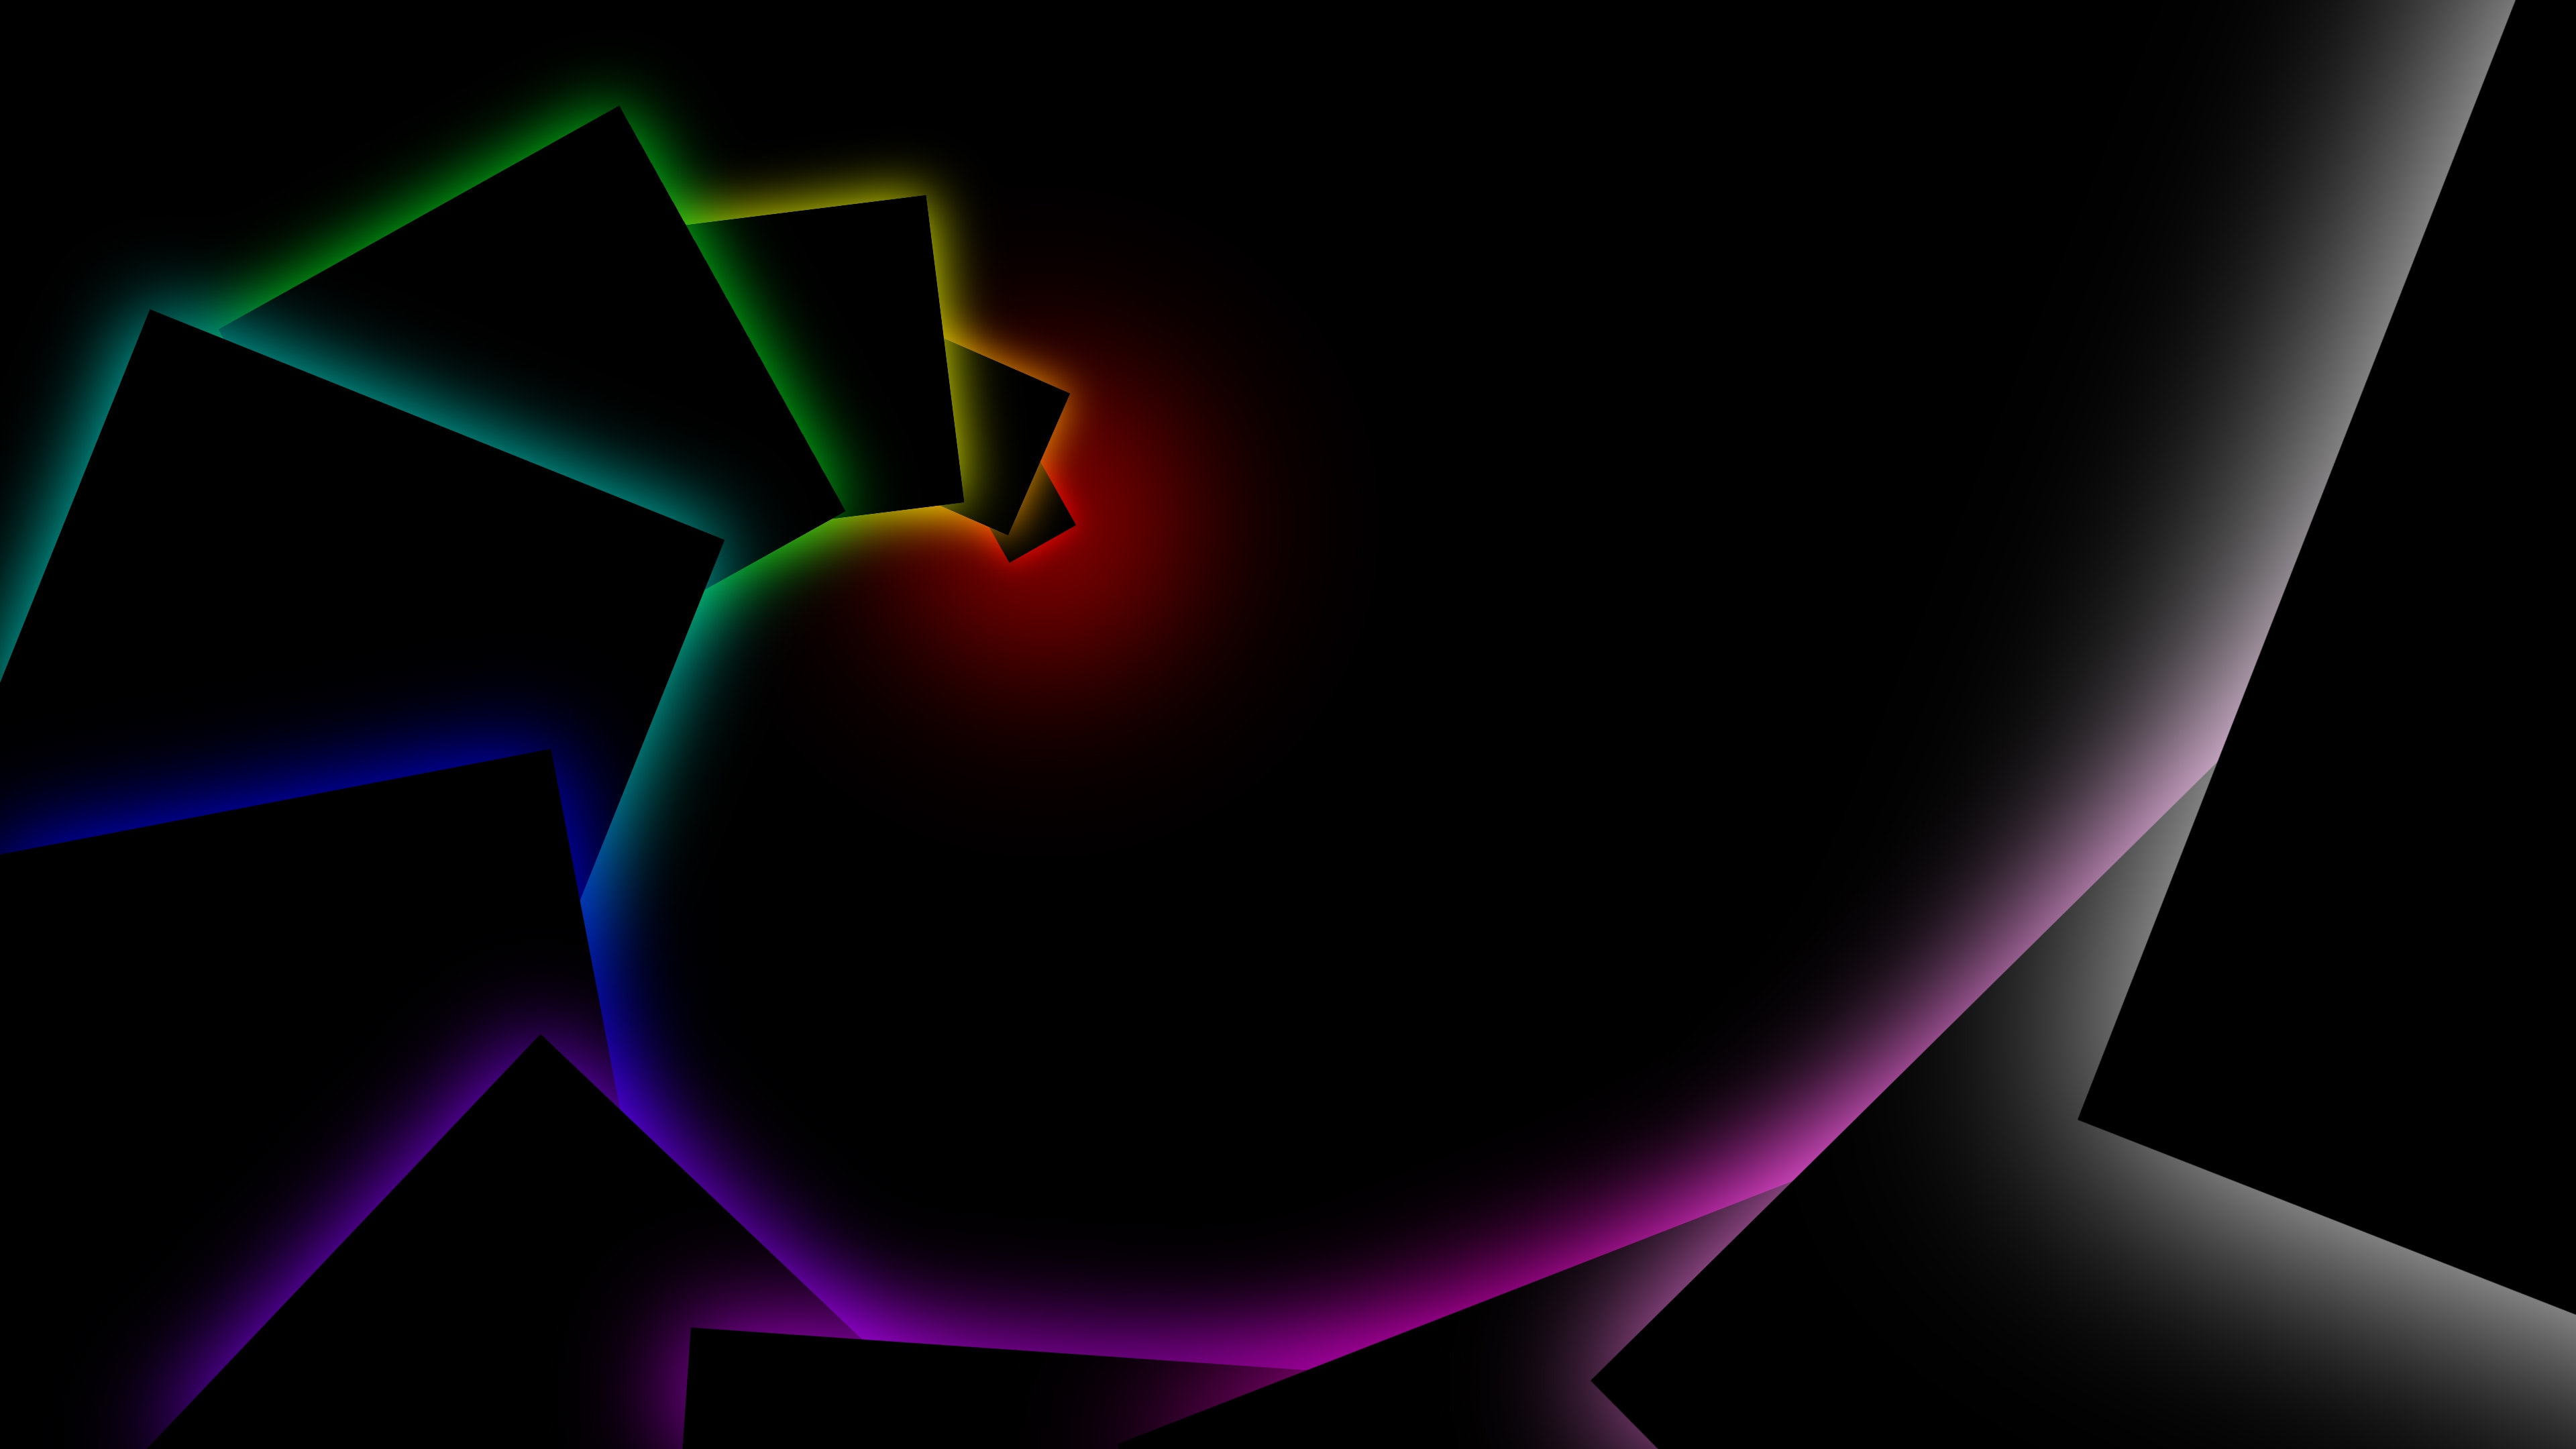 Unduh 88 Wallpaper Tumblr Warna Hitam HD Terbaik